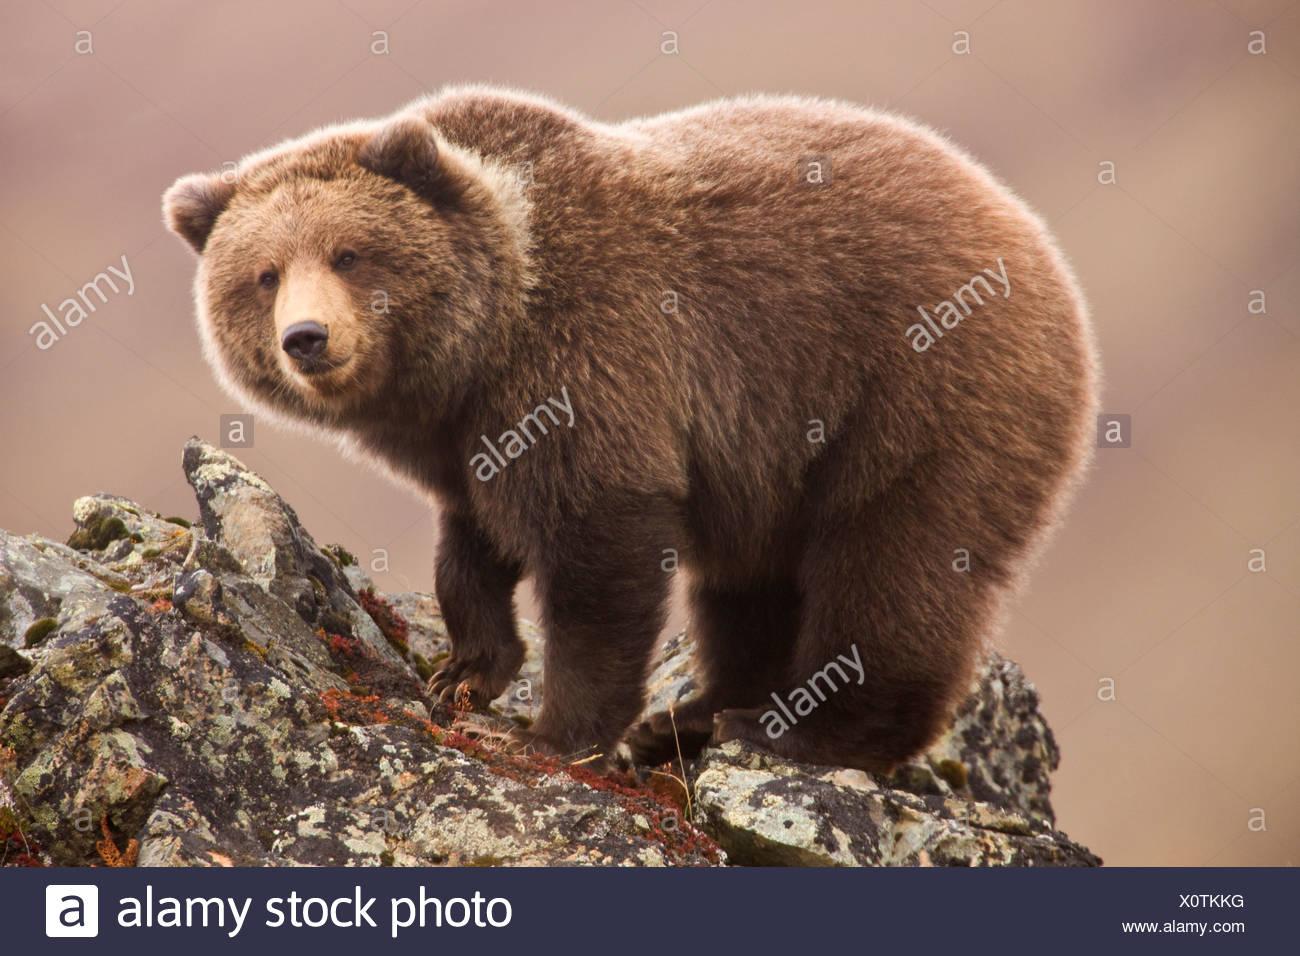 Grizzly Bear, also called Brown Bear, Denali National Park, Alaska. - Stock Image